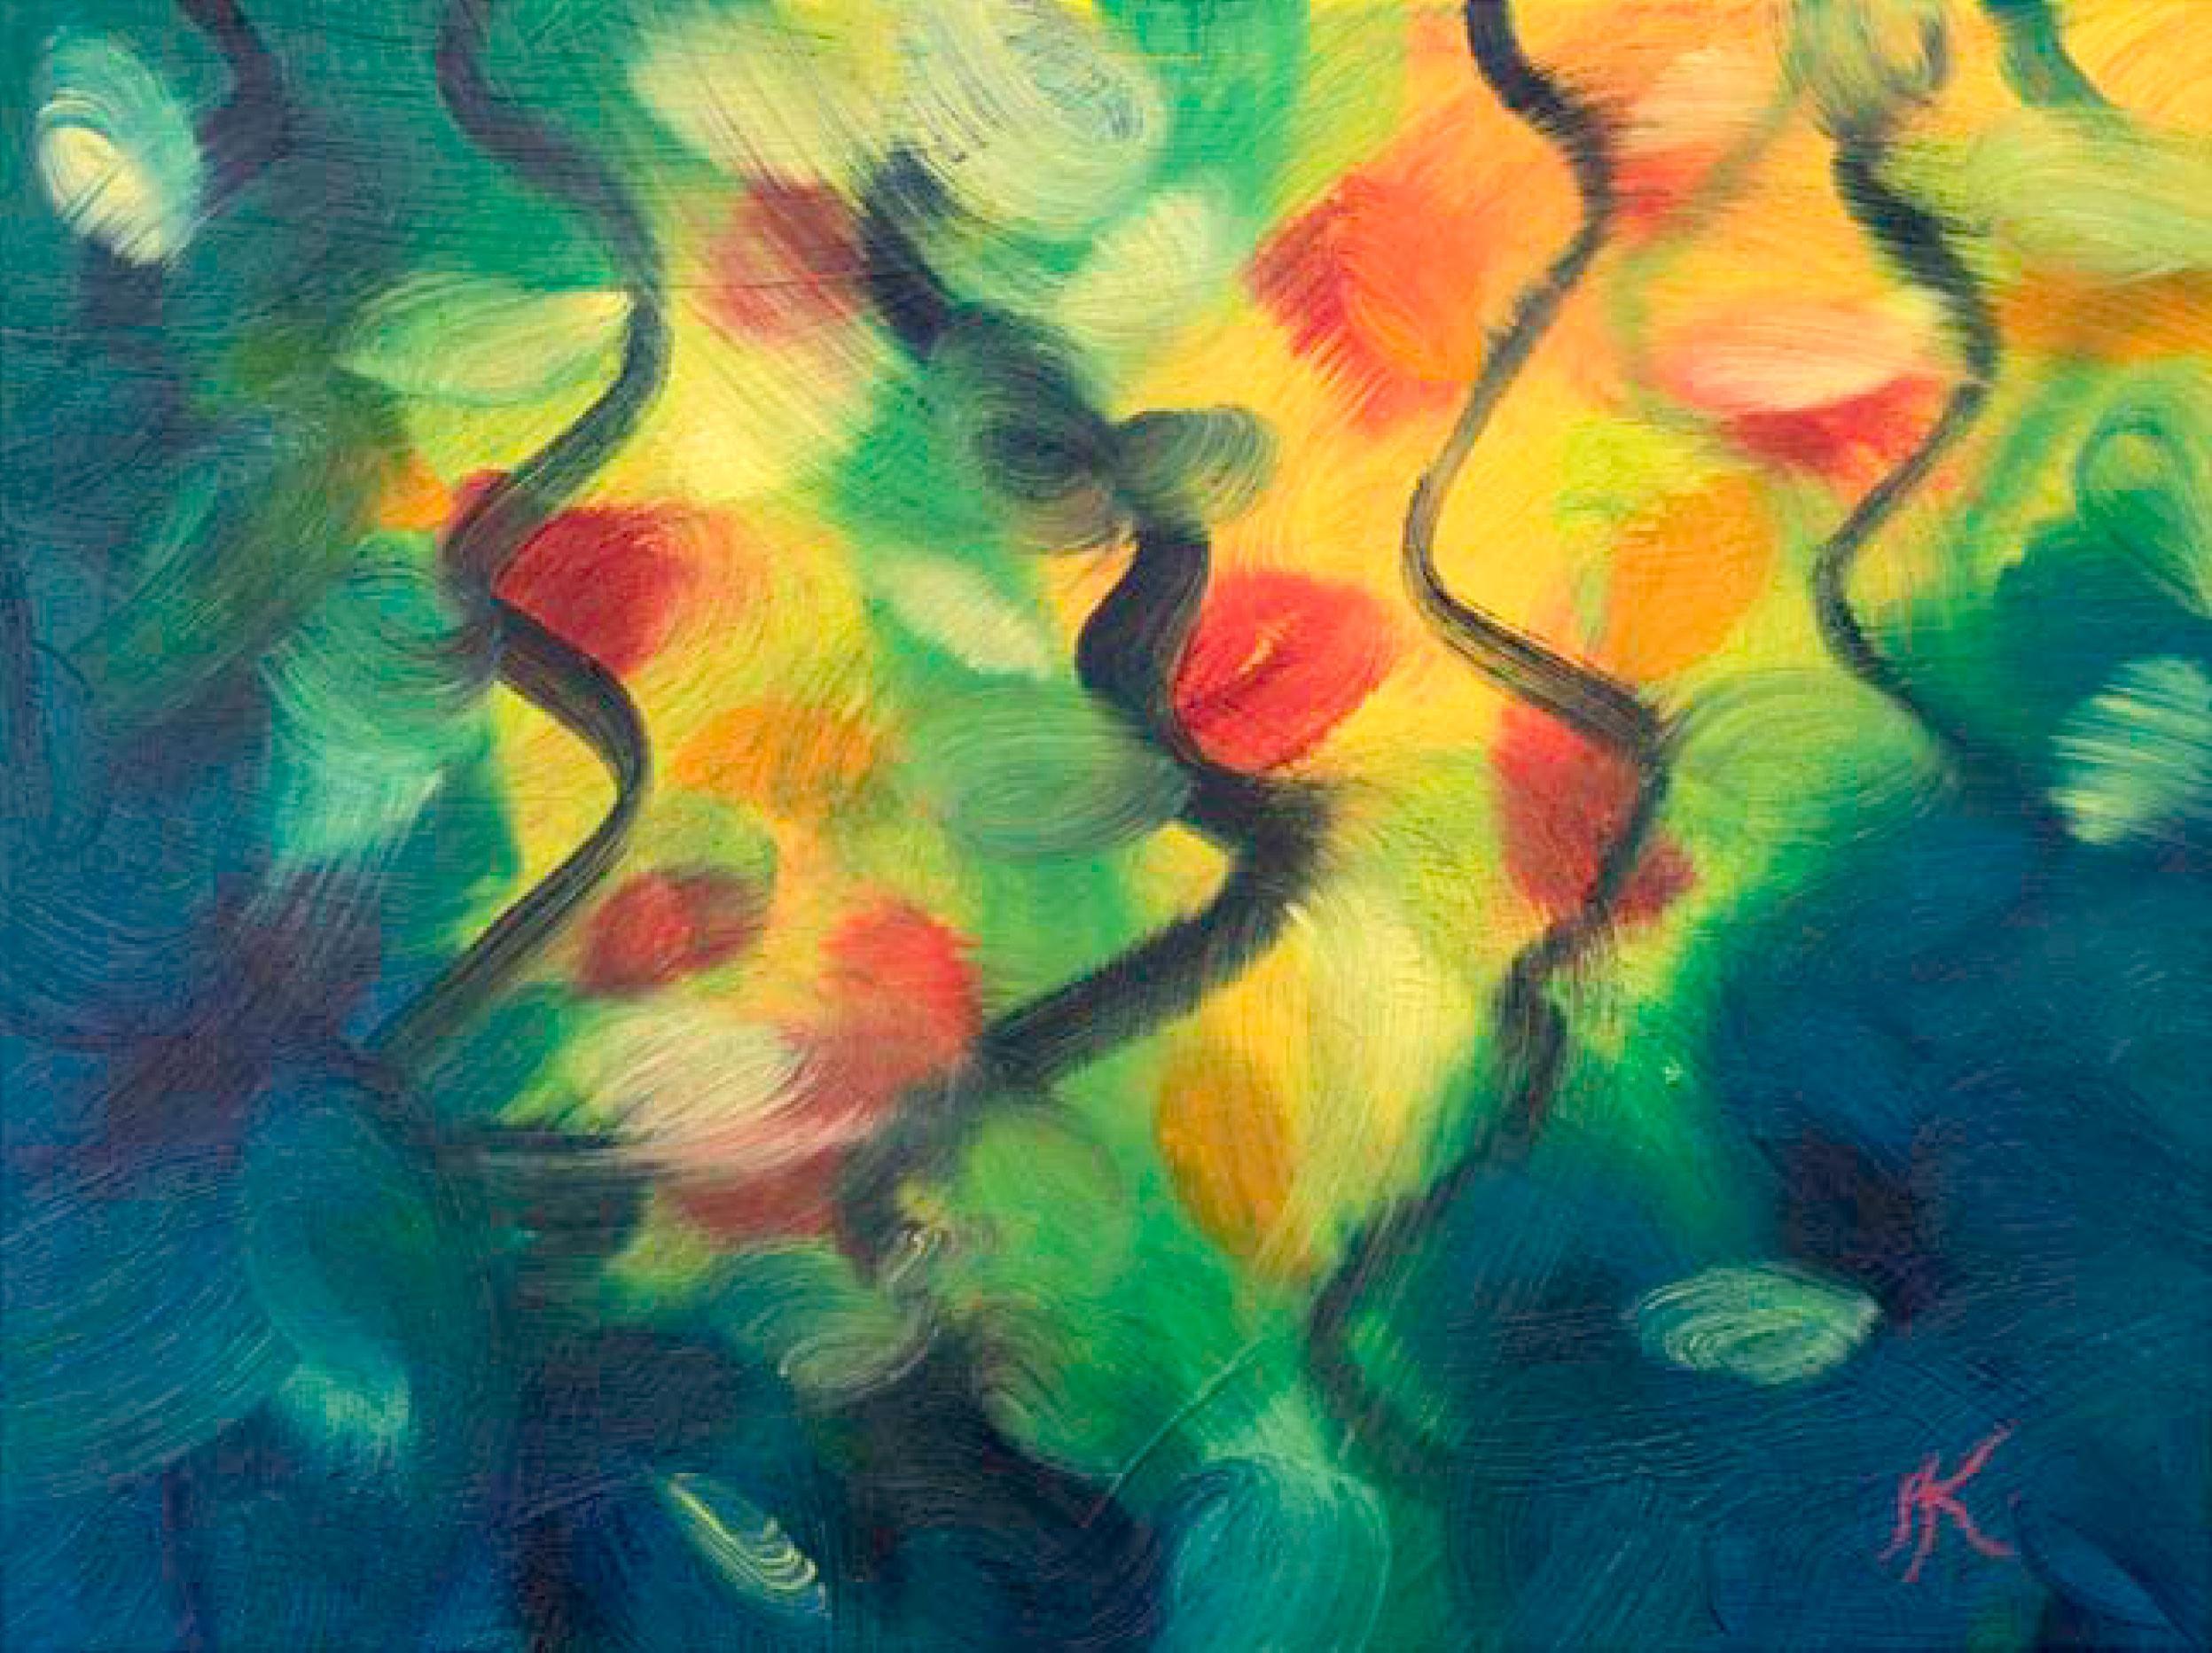 Transforming Nature III, 2016, Öl auf Leinwand, 40 x 30 cm